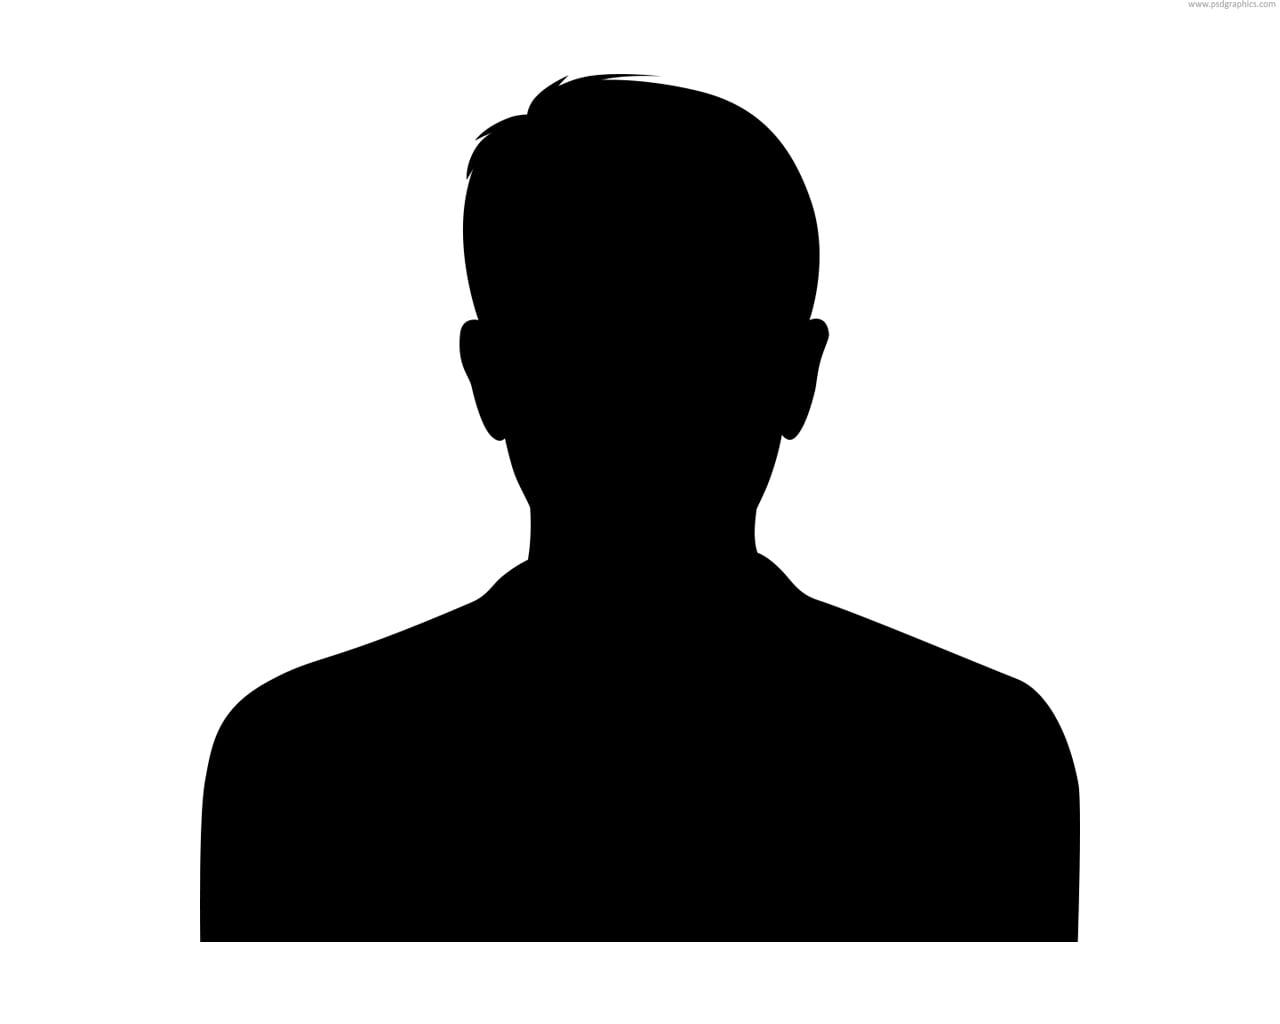 male-silhouette.jpg